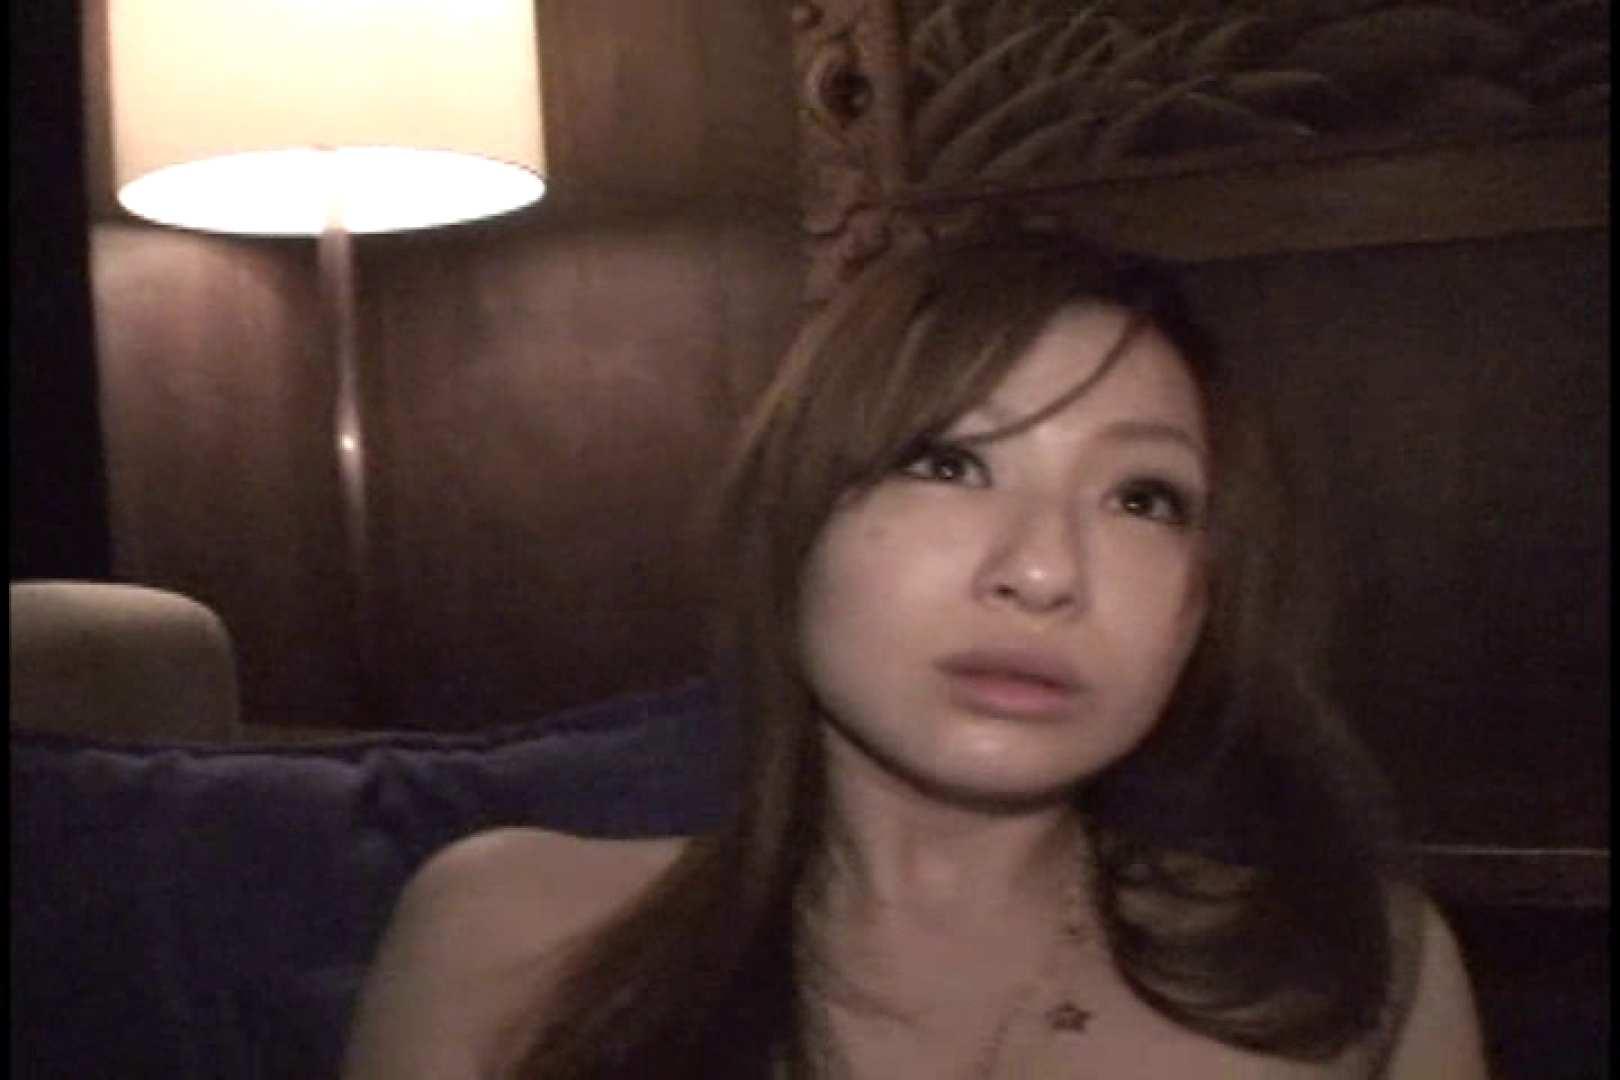 JDハンター全国ツアー vol.015 前編 女子大生丸裸  85pic 62